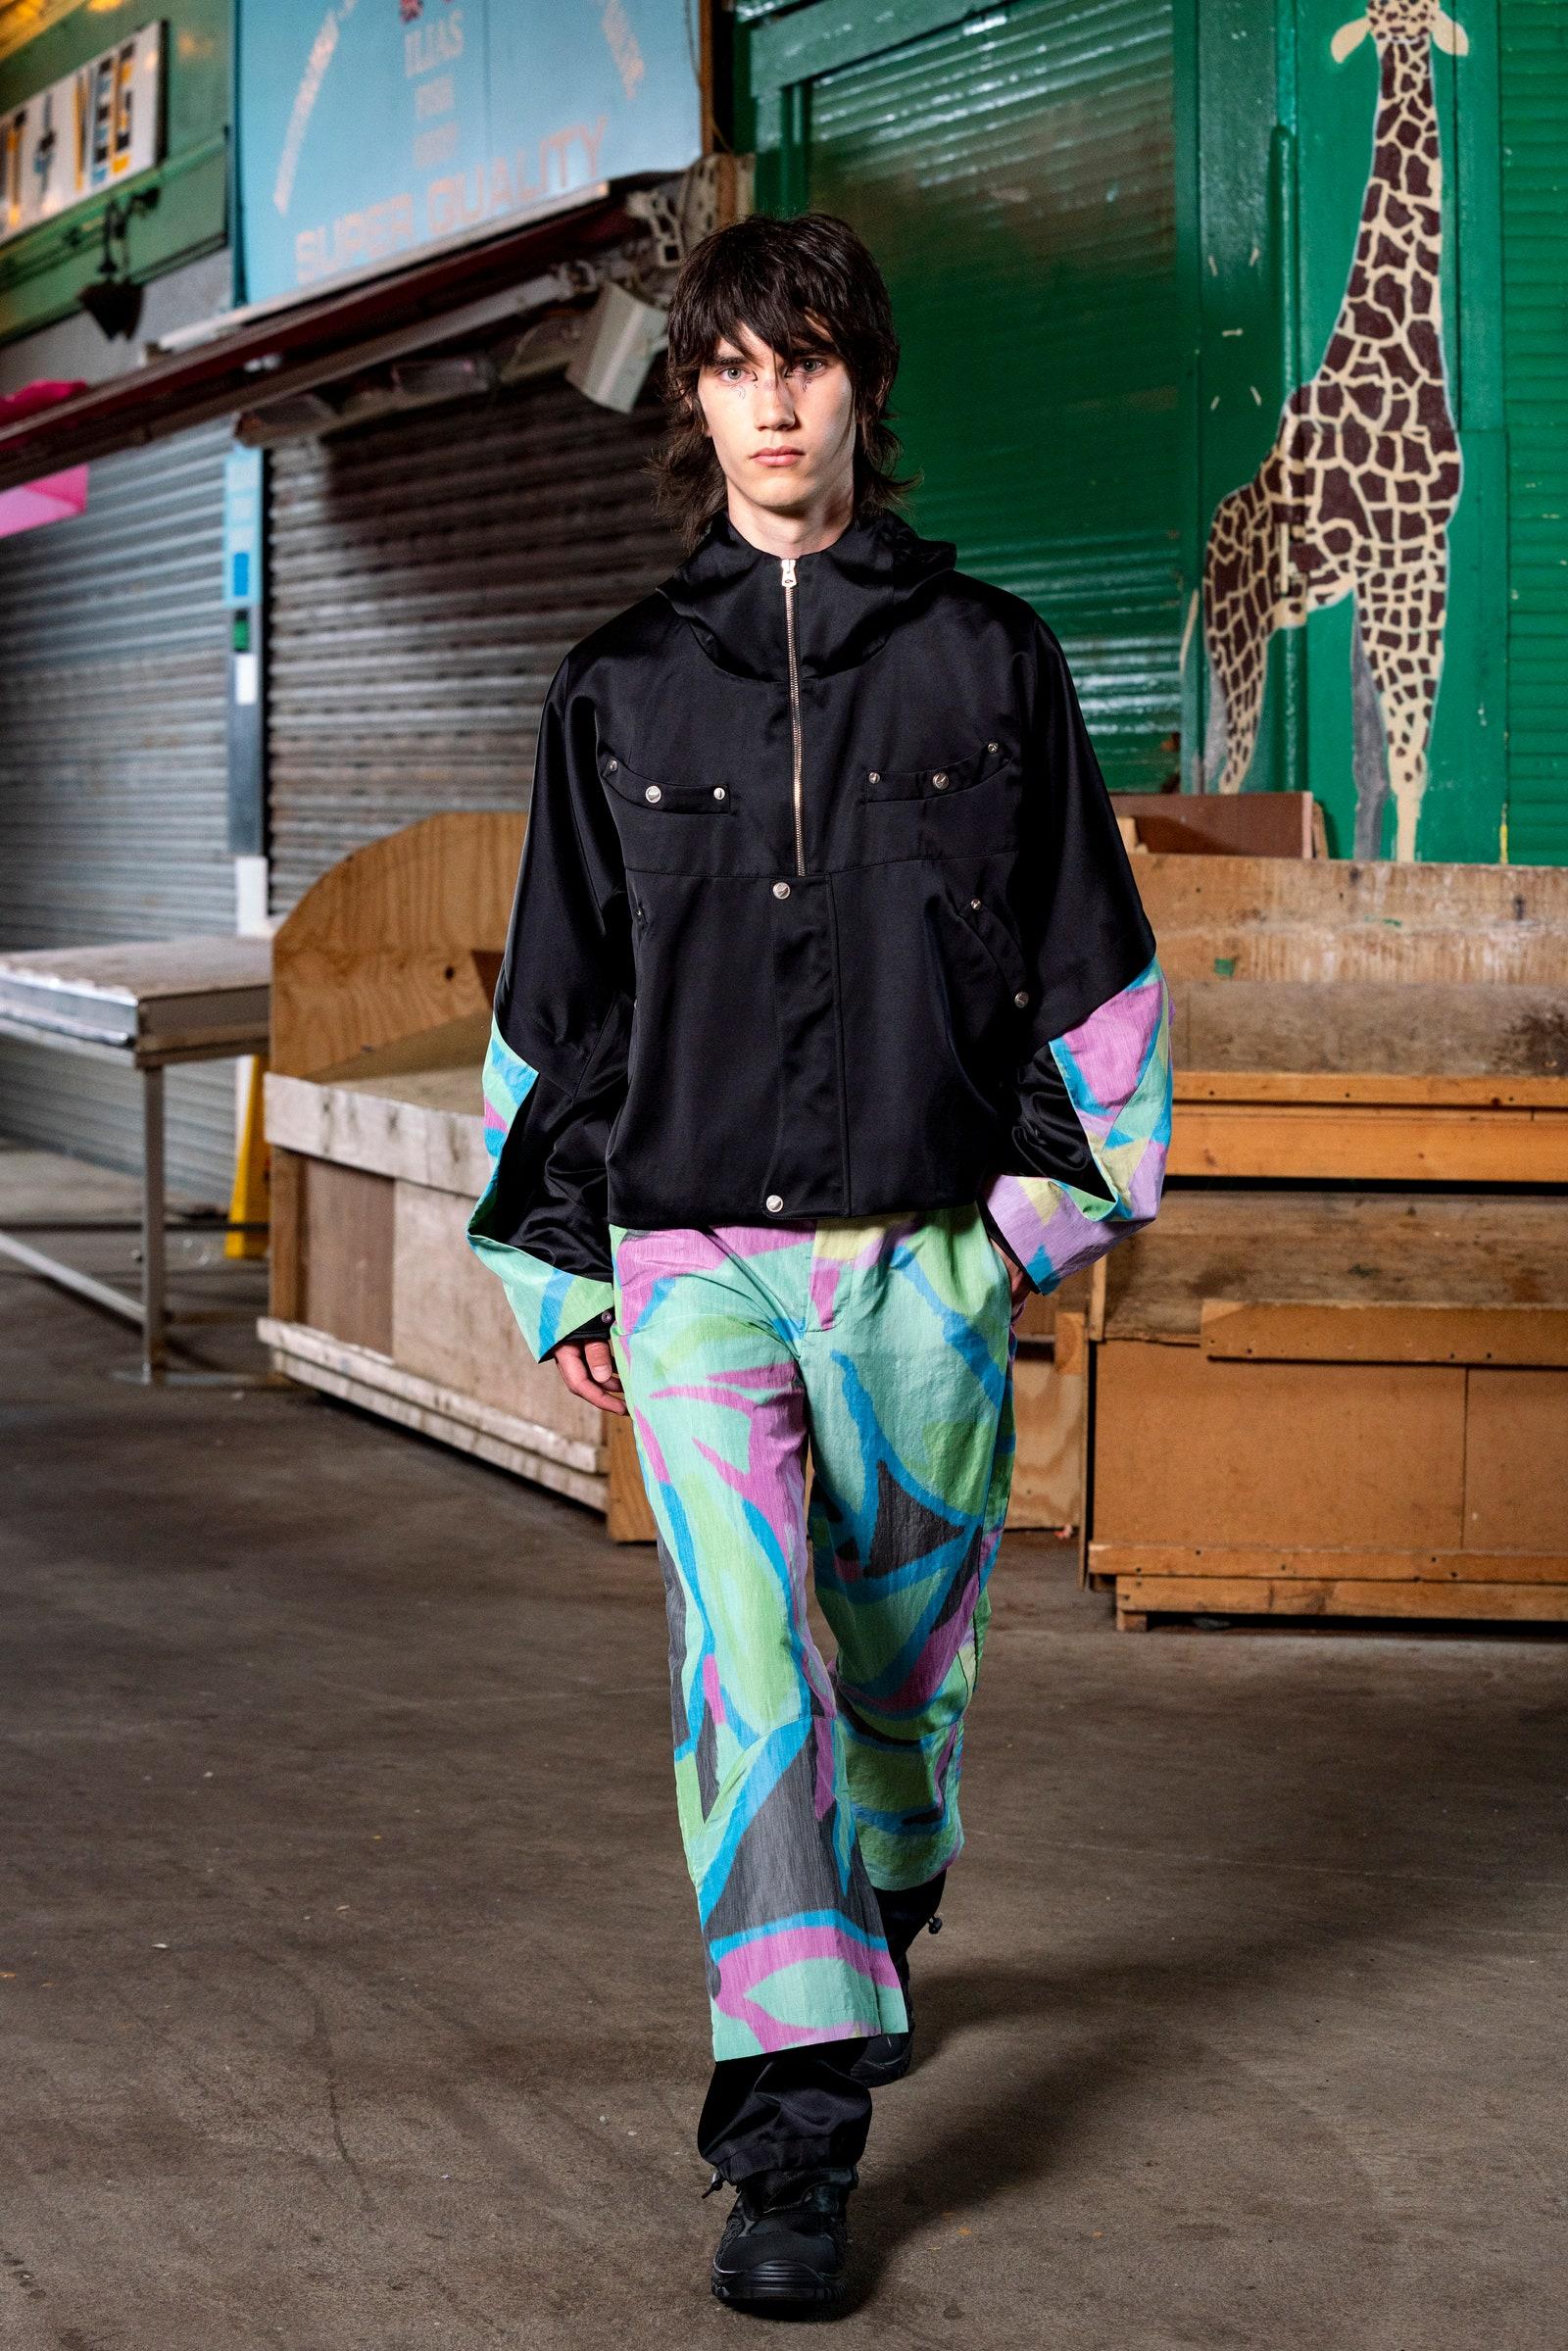 In Fashion's Fan Fiction Era Kiko Kostadinov Thinks For Himself